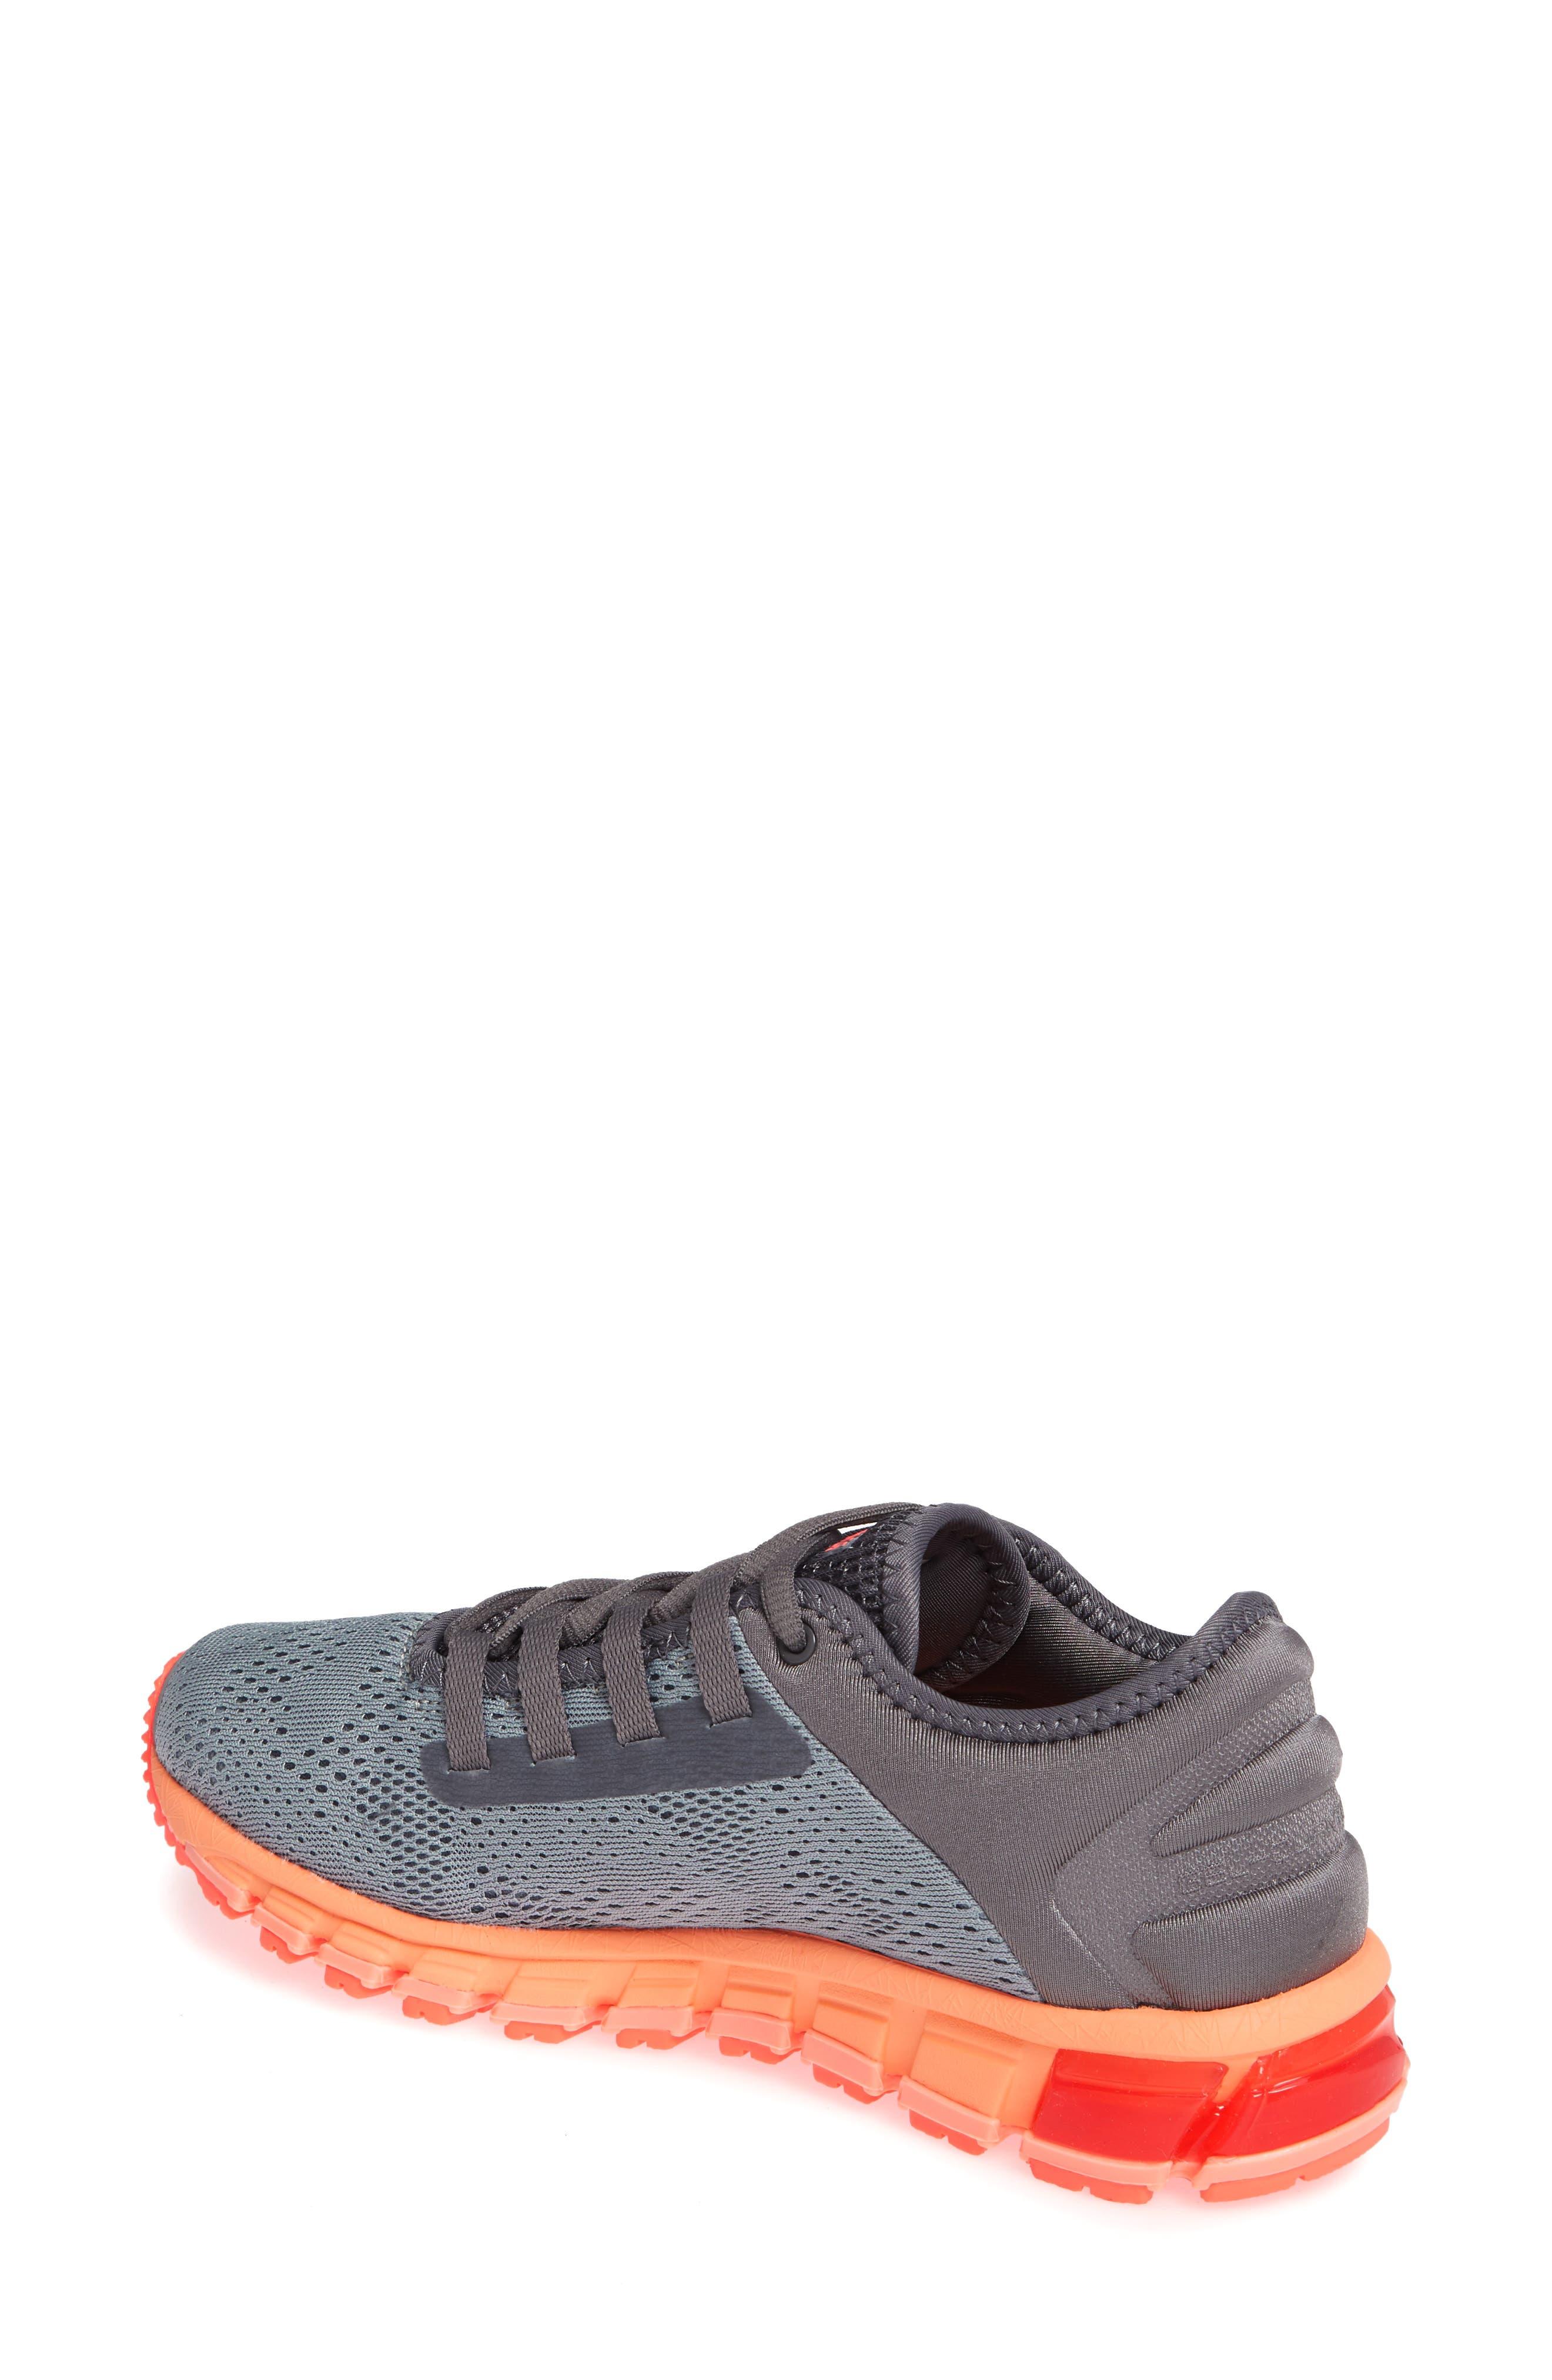 GEL Quantum 180 3 Running Shoe,                             Alternate thumbnail 2, color,                             020